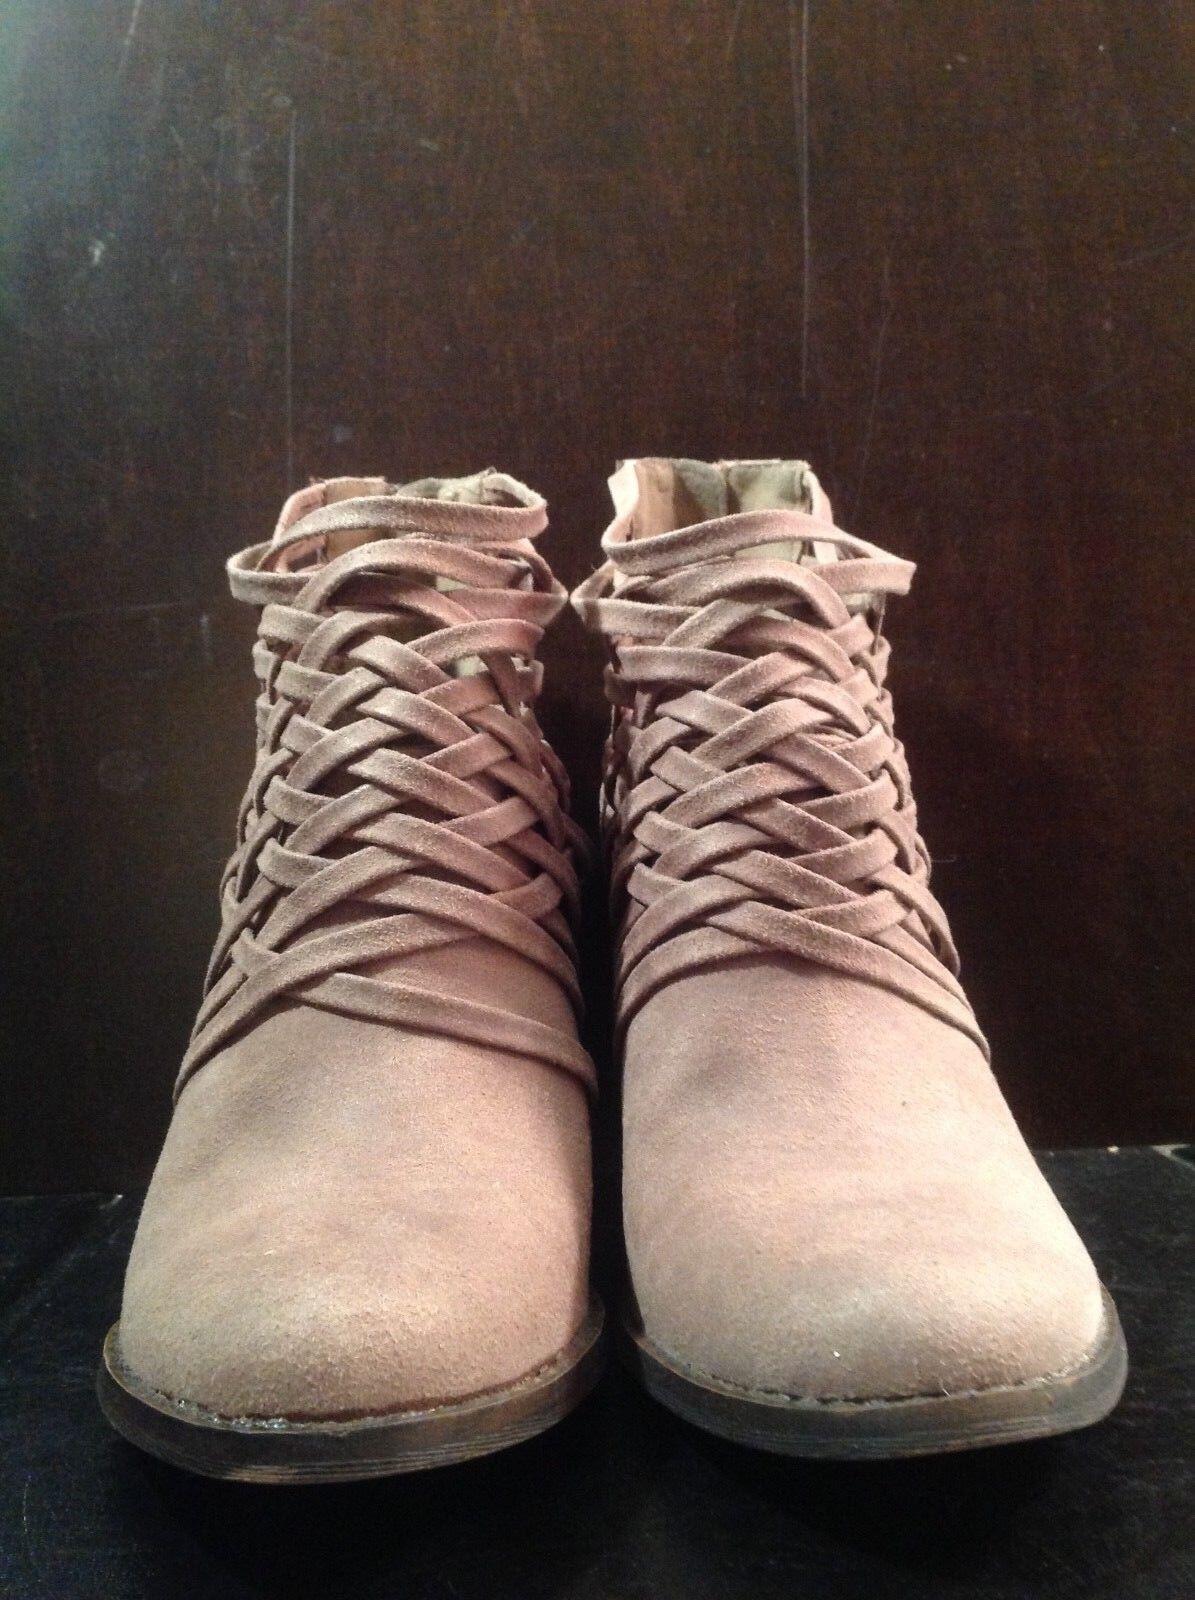 New Fergalicious 9.5M Damenschuhe Weever Boot, Doe, 9.5M Fergalicious US 7b8864